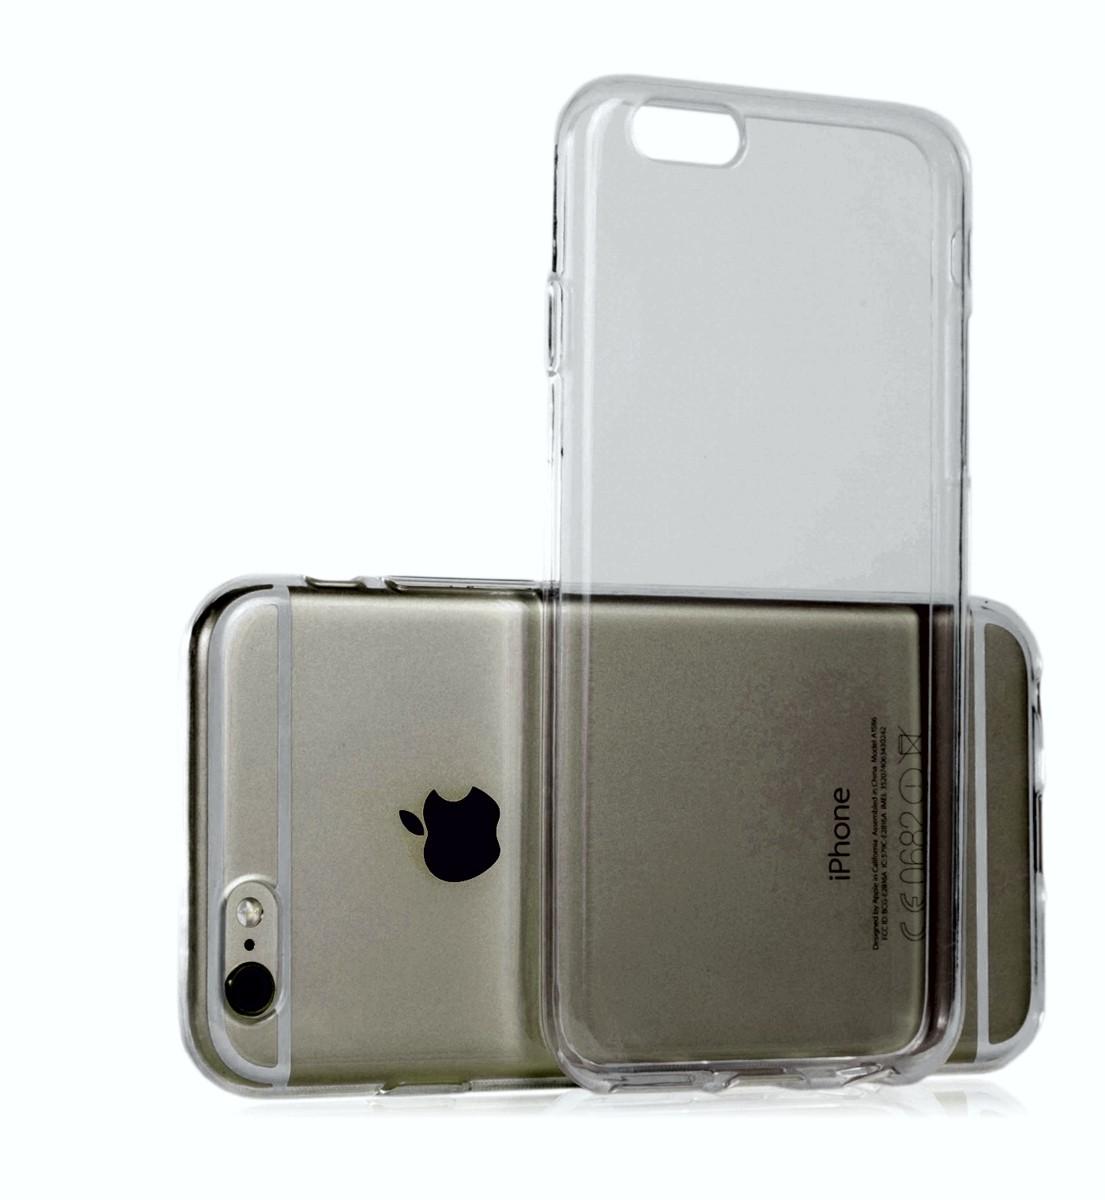 2go tpu case pour apple iphone 7 transparent portable acc tpu case. Black Bedroom Furniture Sets. Home Design Ideas